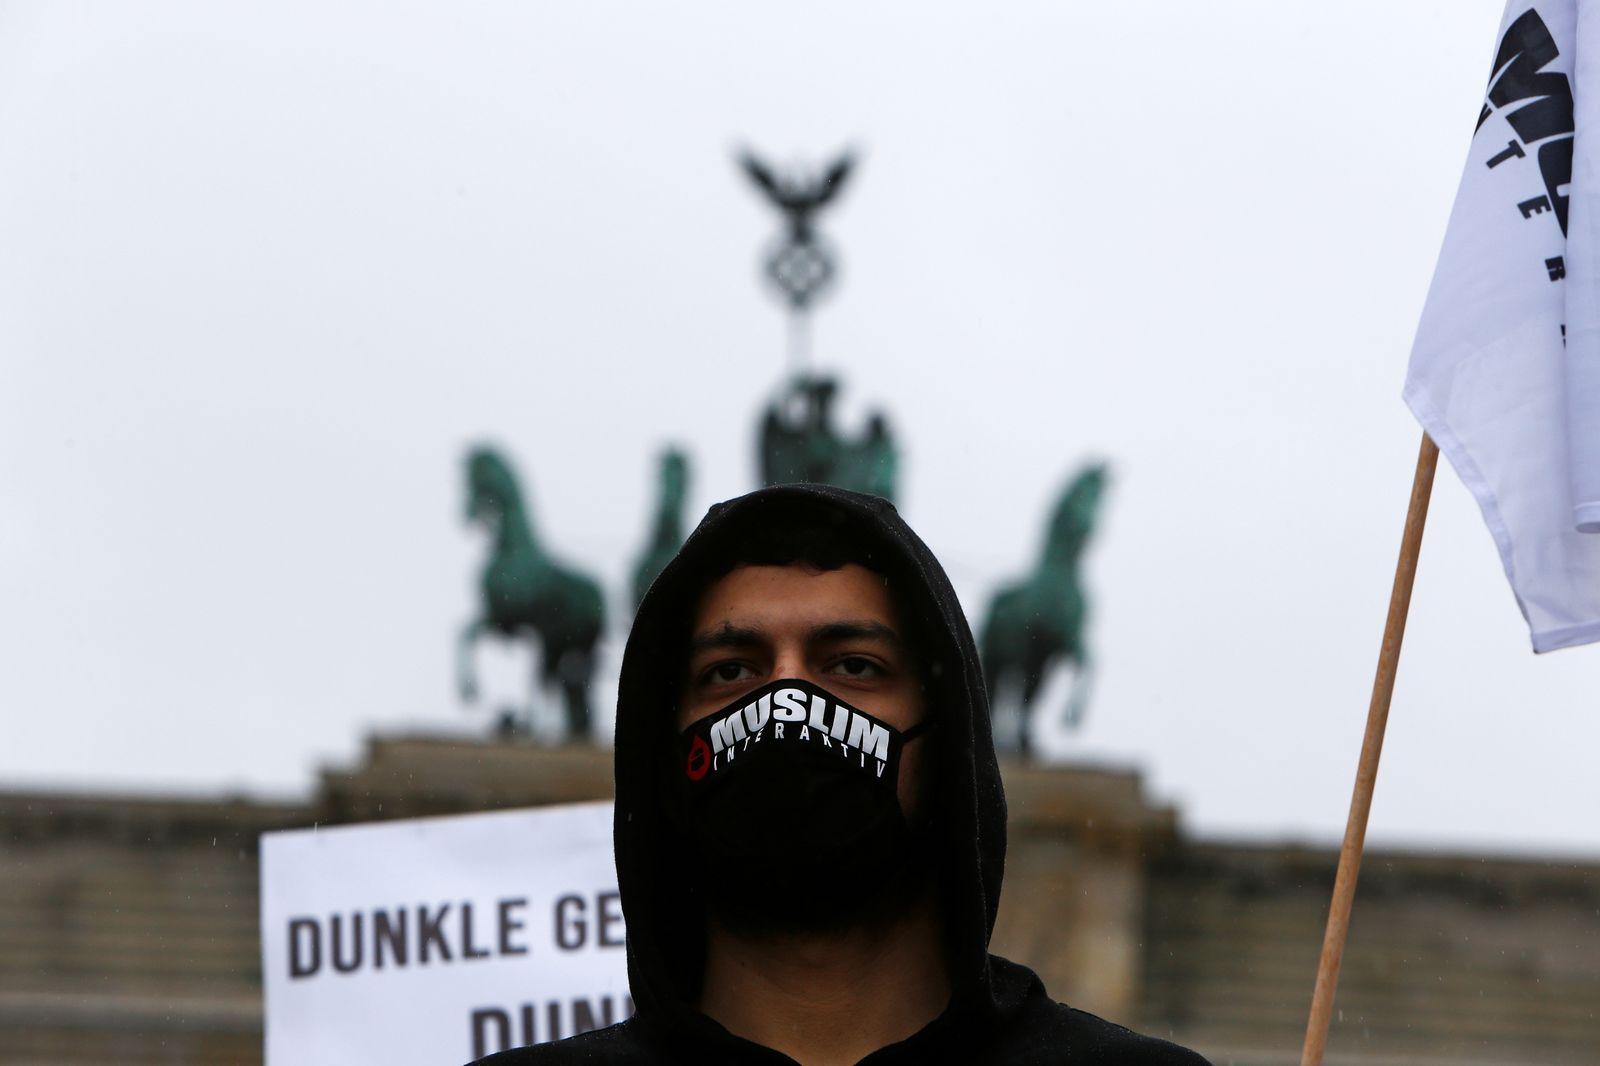 Protesters of the Muslim Interaktiv organisation demonstrate in Berlin